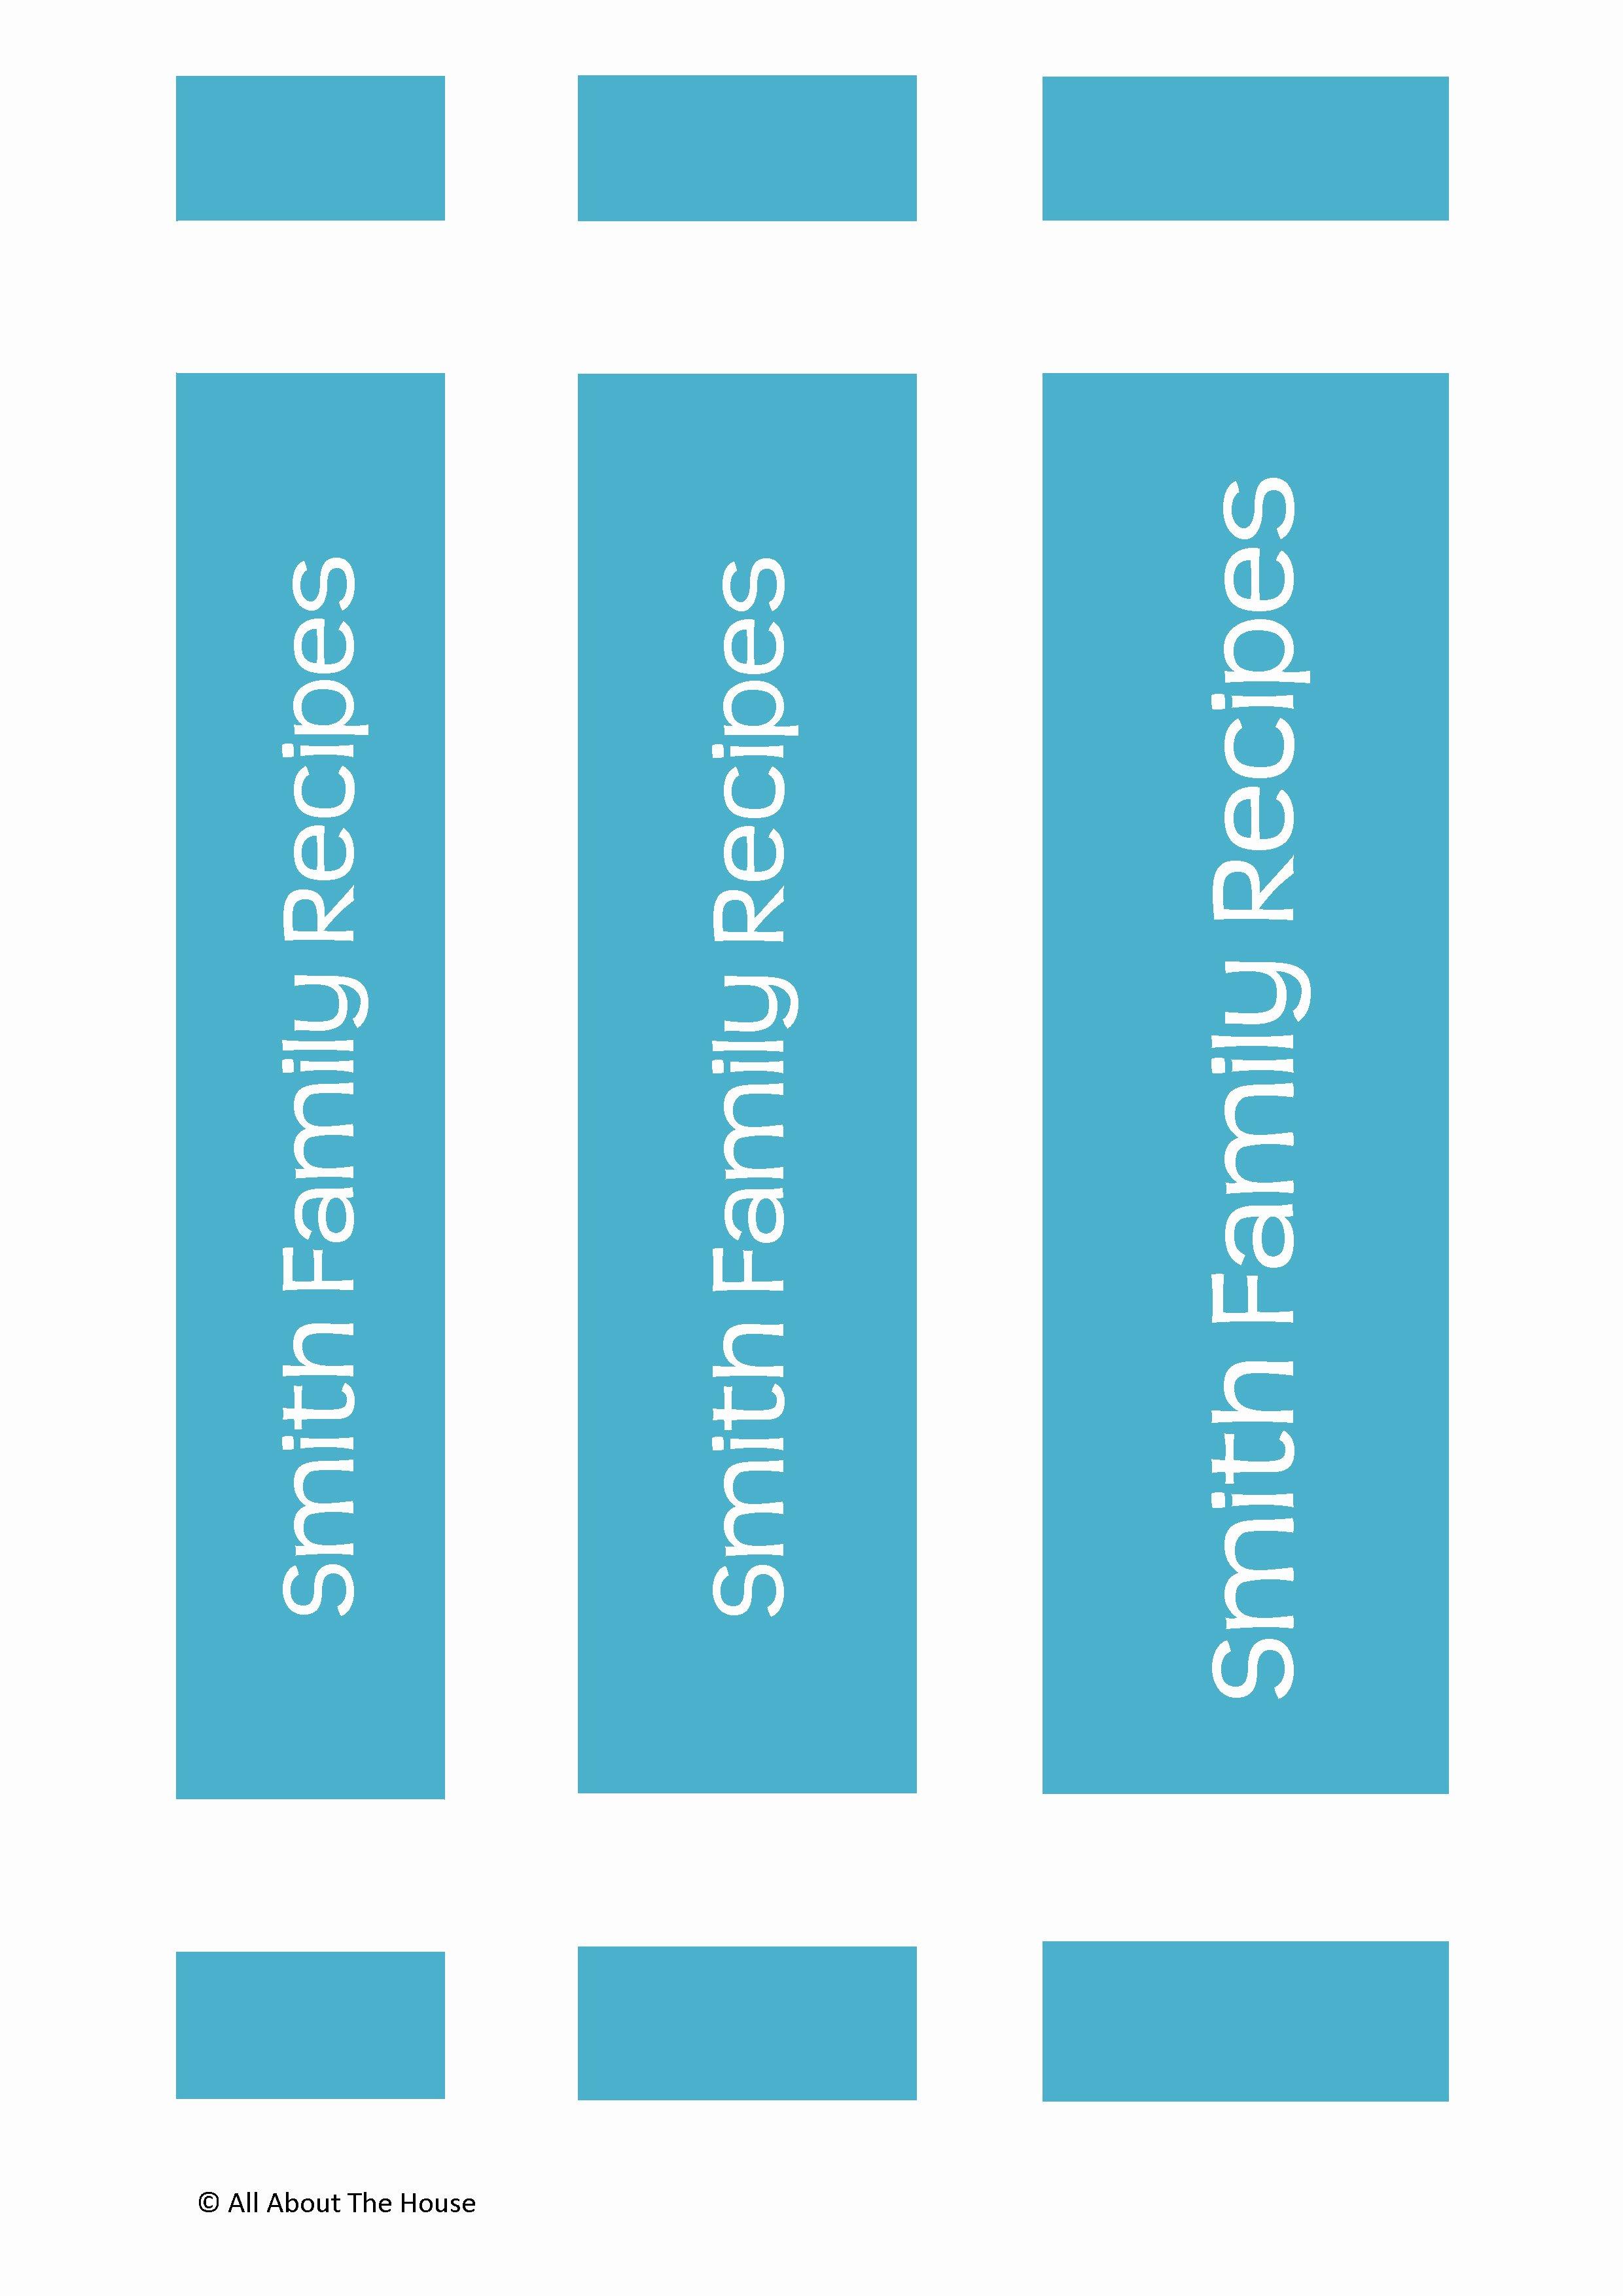 Binder Spine Label Template Fresh Make Your Own Personalised Printable Recipe Binder